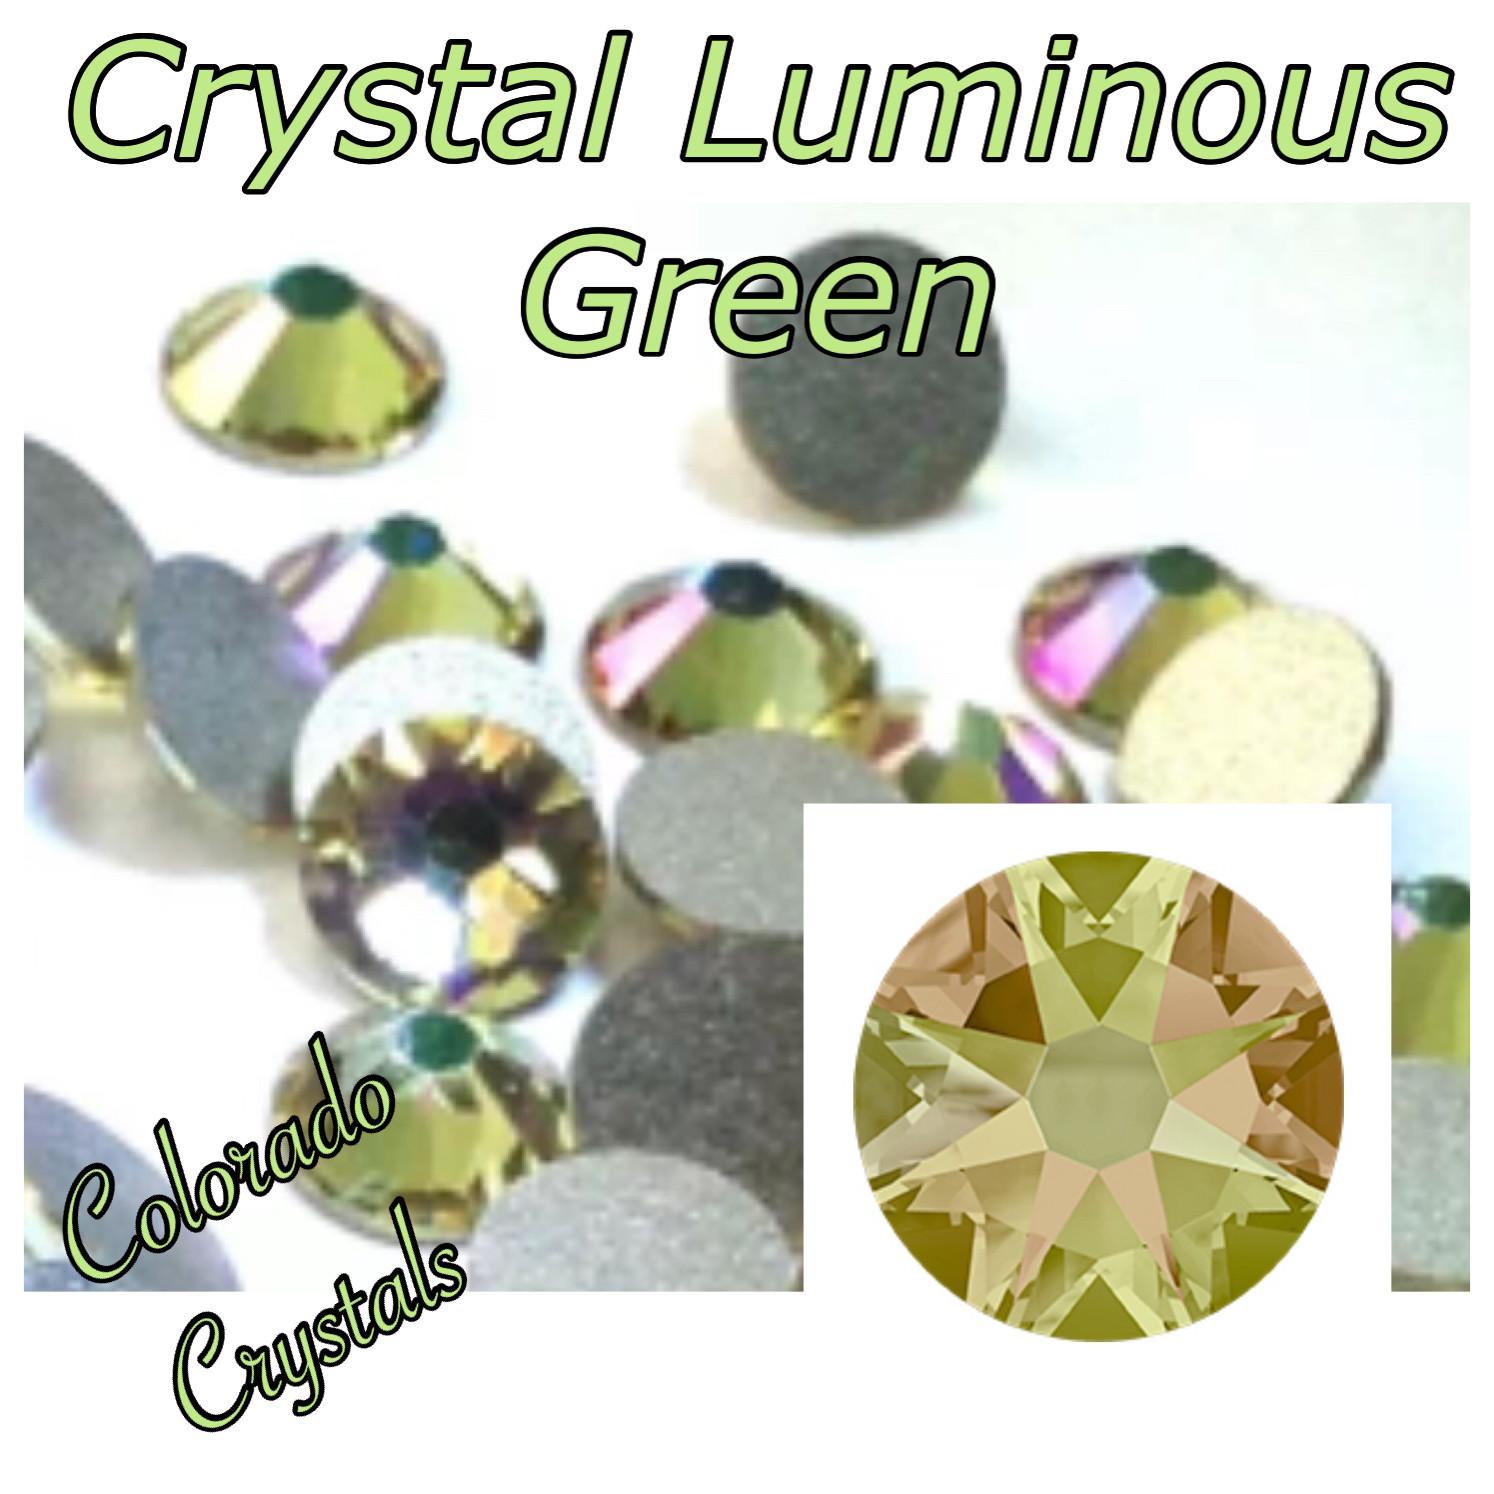 Luminous Green (Crystal) 20ss 2058 Limited Swarovski Sale